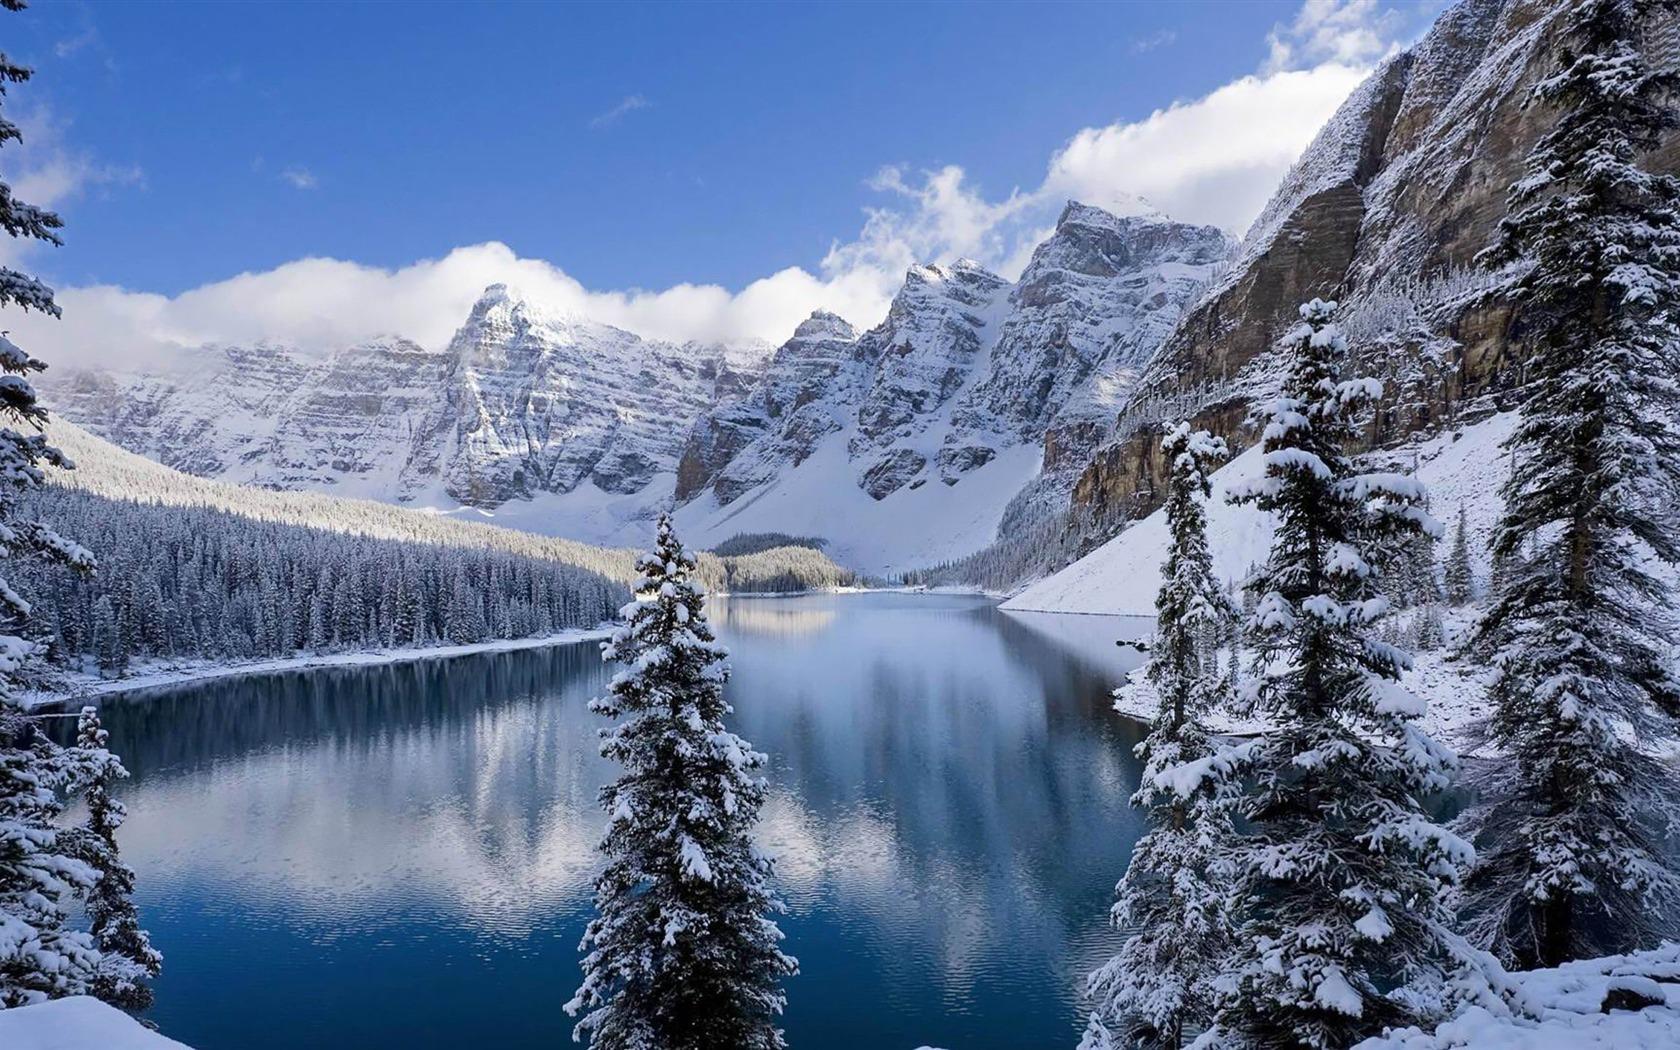 Montana Winter Wallpapers Top Free Montana Winter Backgrounds Wallpaperaccess